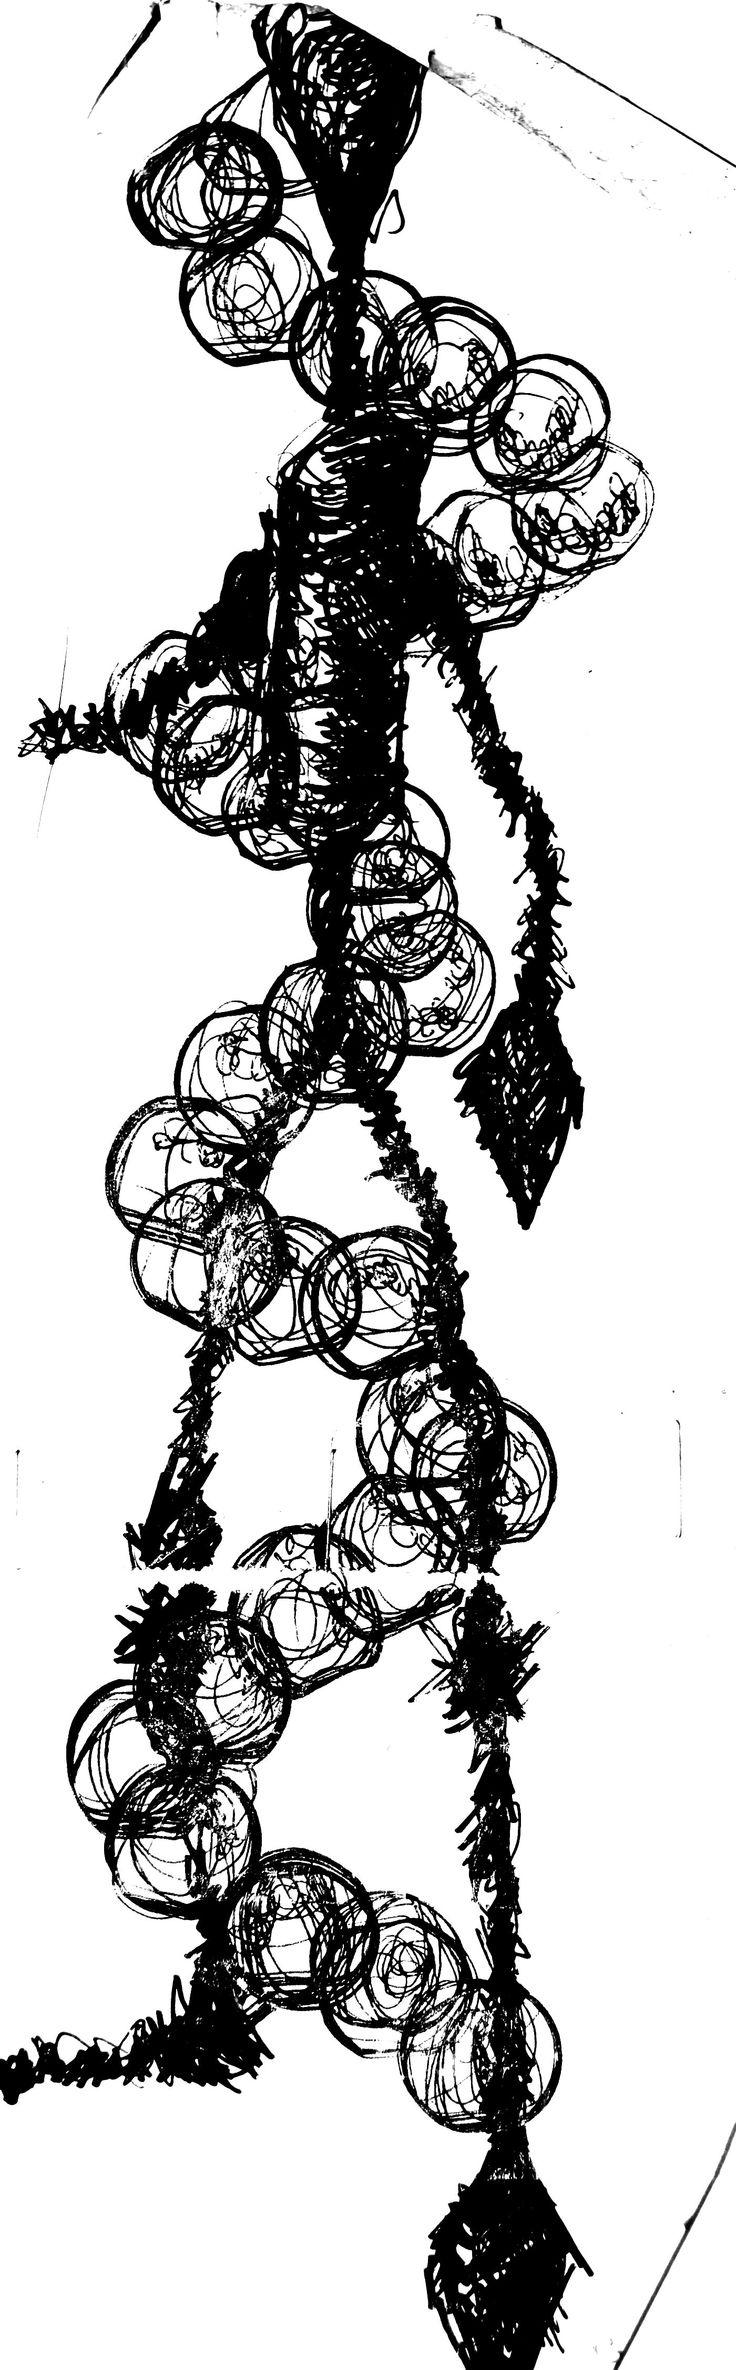 'DNA'